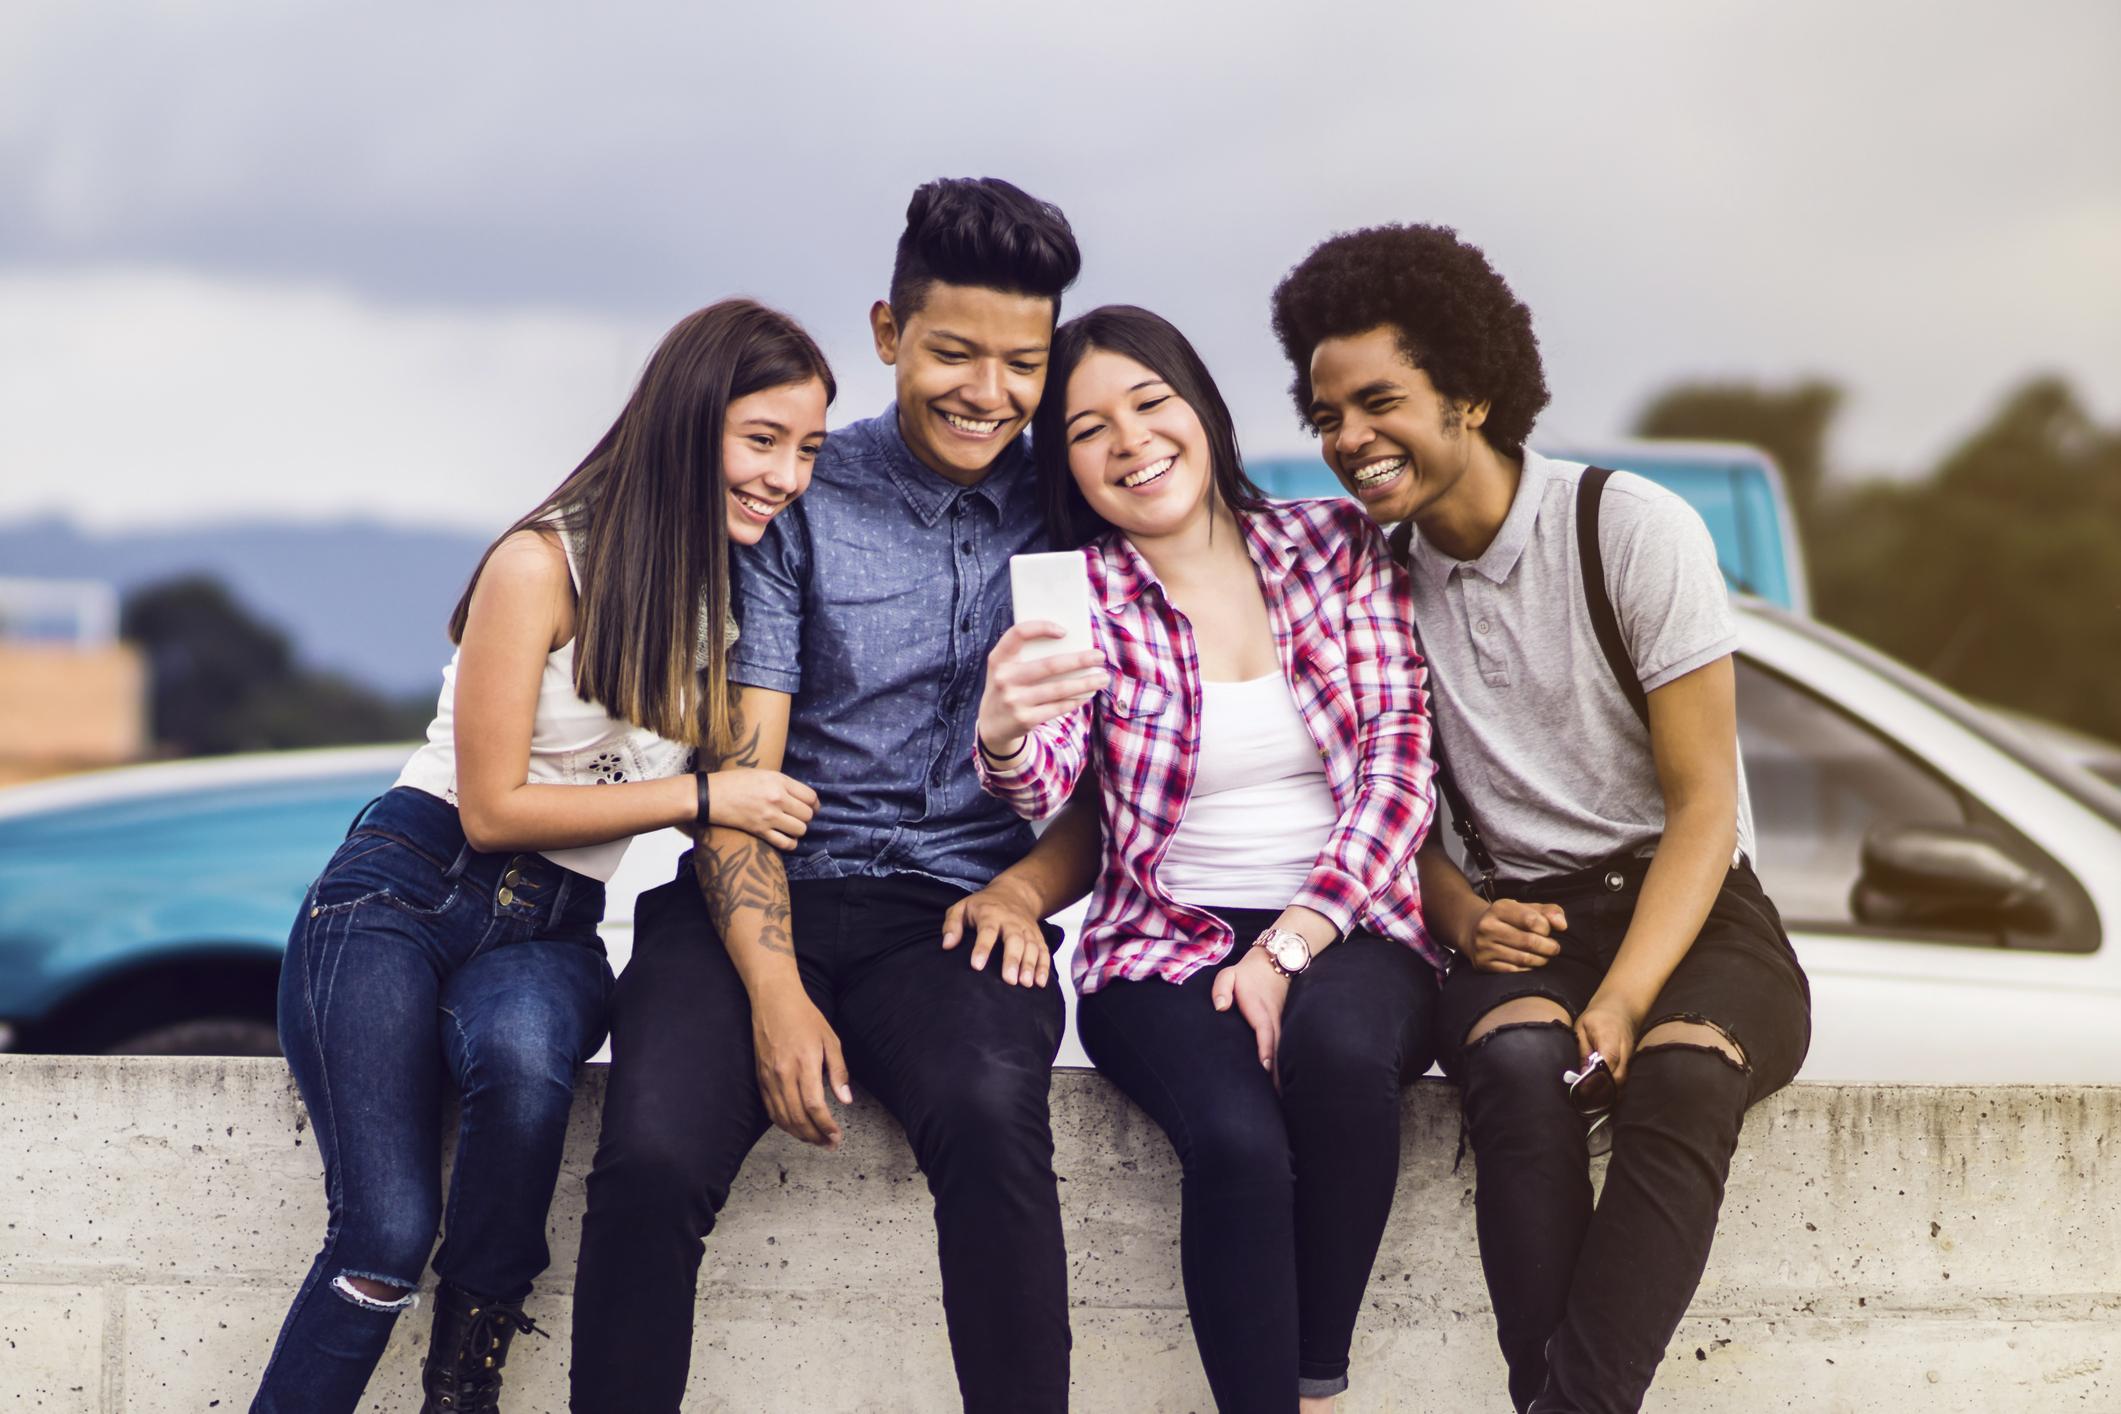 young hispanic population united states tech-savvy